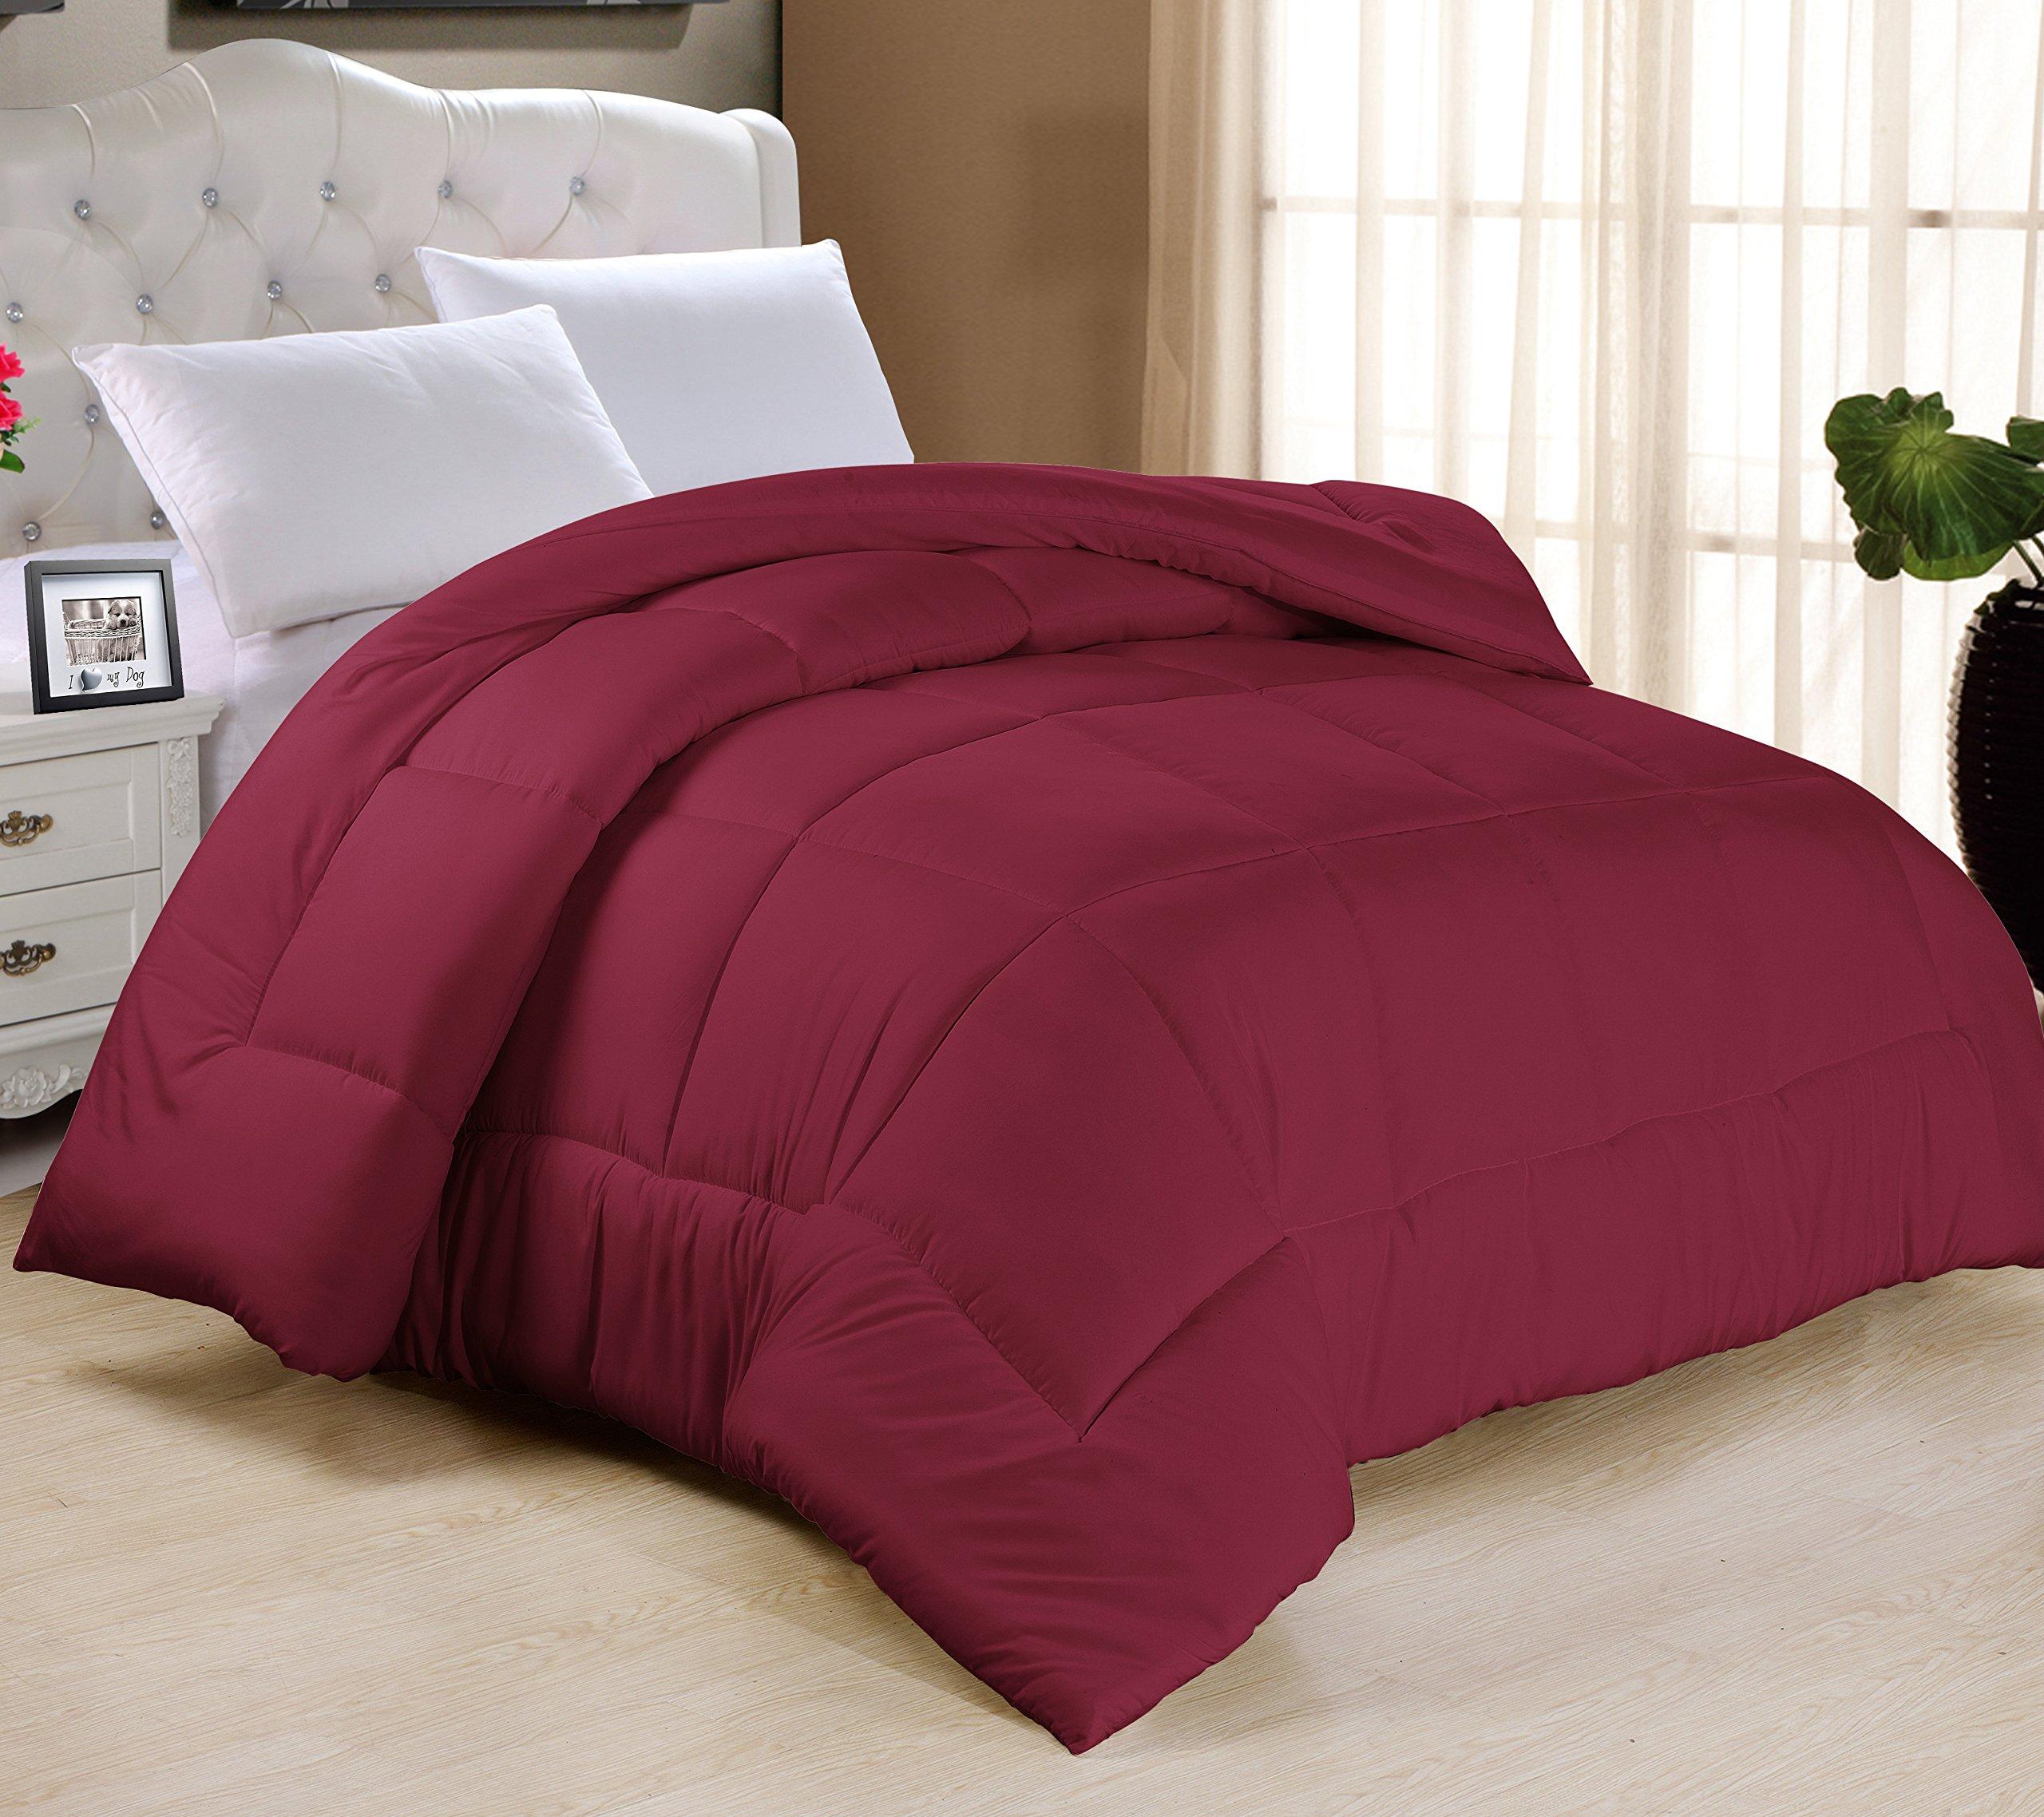 Swift Home All-season Extra Soft Luxurious Classic Light-Warmth Goose Down-Alternative Comforter, Full 78'' x 90'', Burgundy